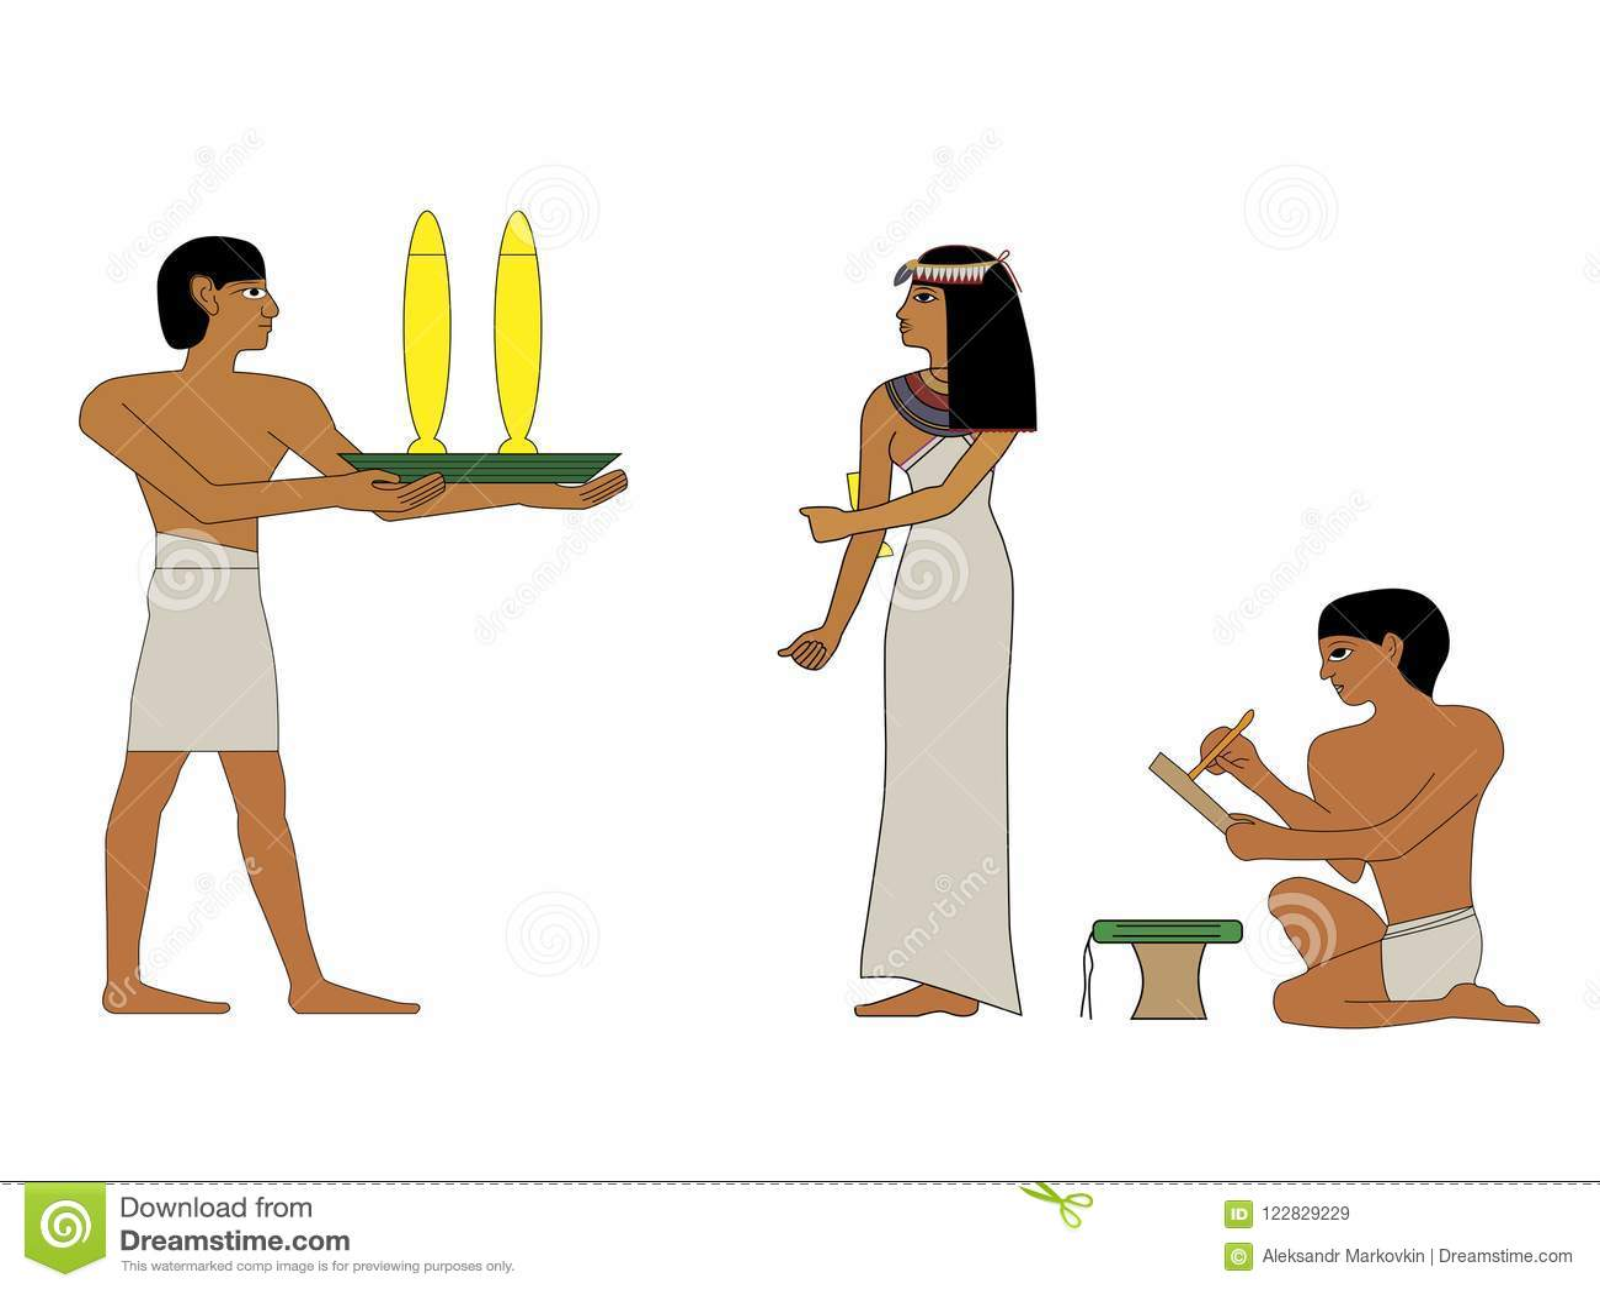 Image result for ancient egypt people 고대의 막장 드라마- 두 형제 이야기